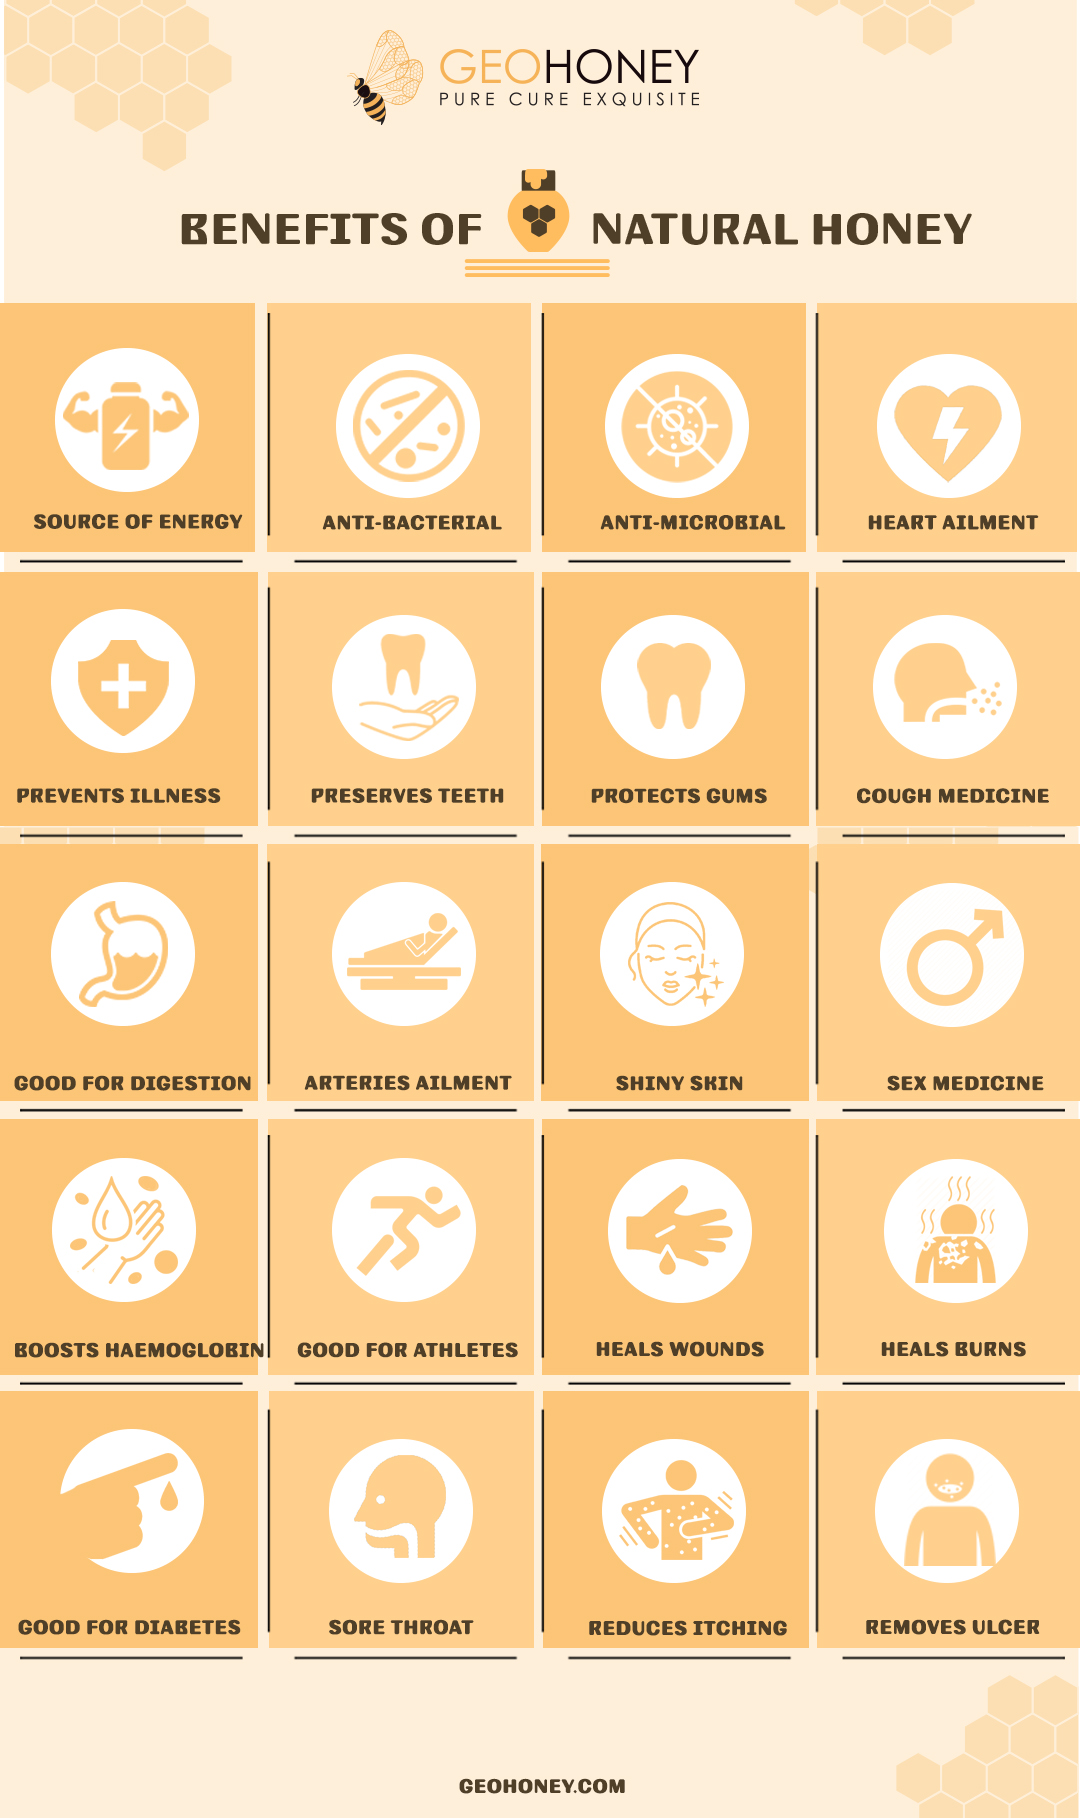 Natural honey benefits